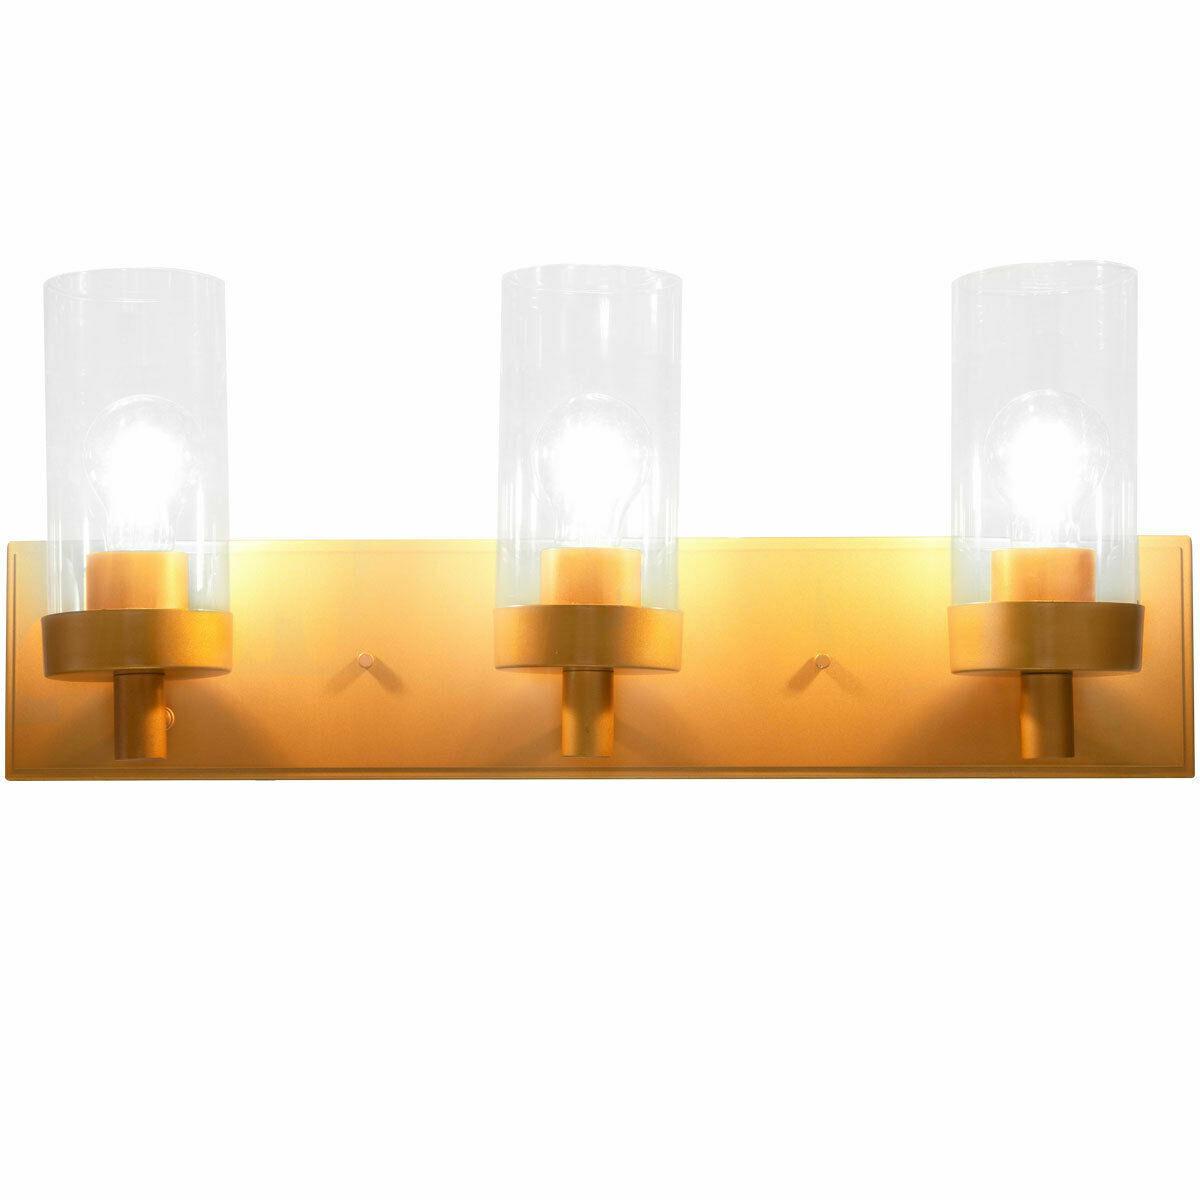 Home Decor Bathroom 3 Glass Light Shade Bath Vanity Fixture Chrome Finish For Sale Online Ebay